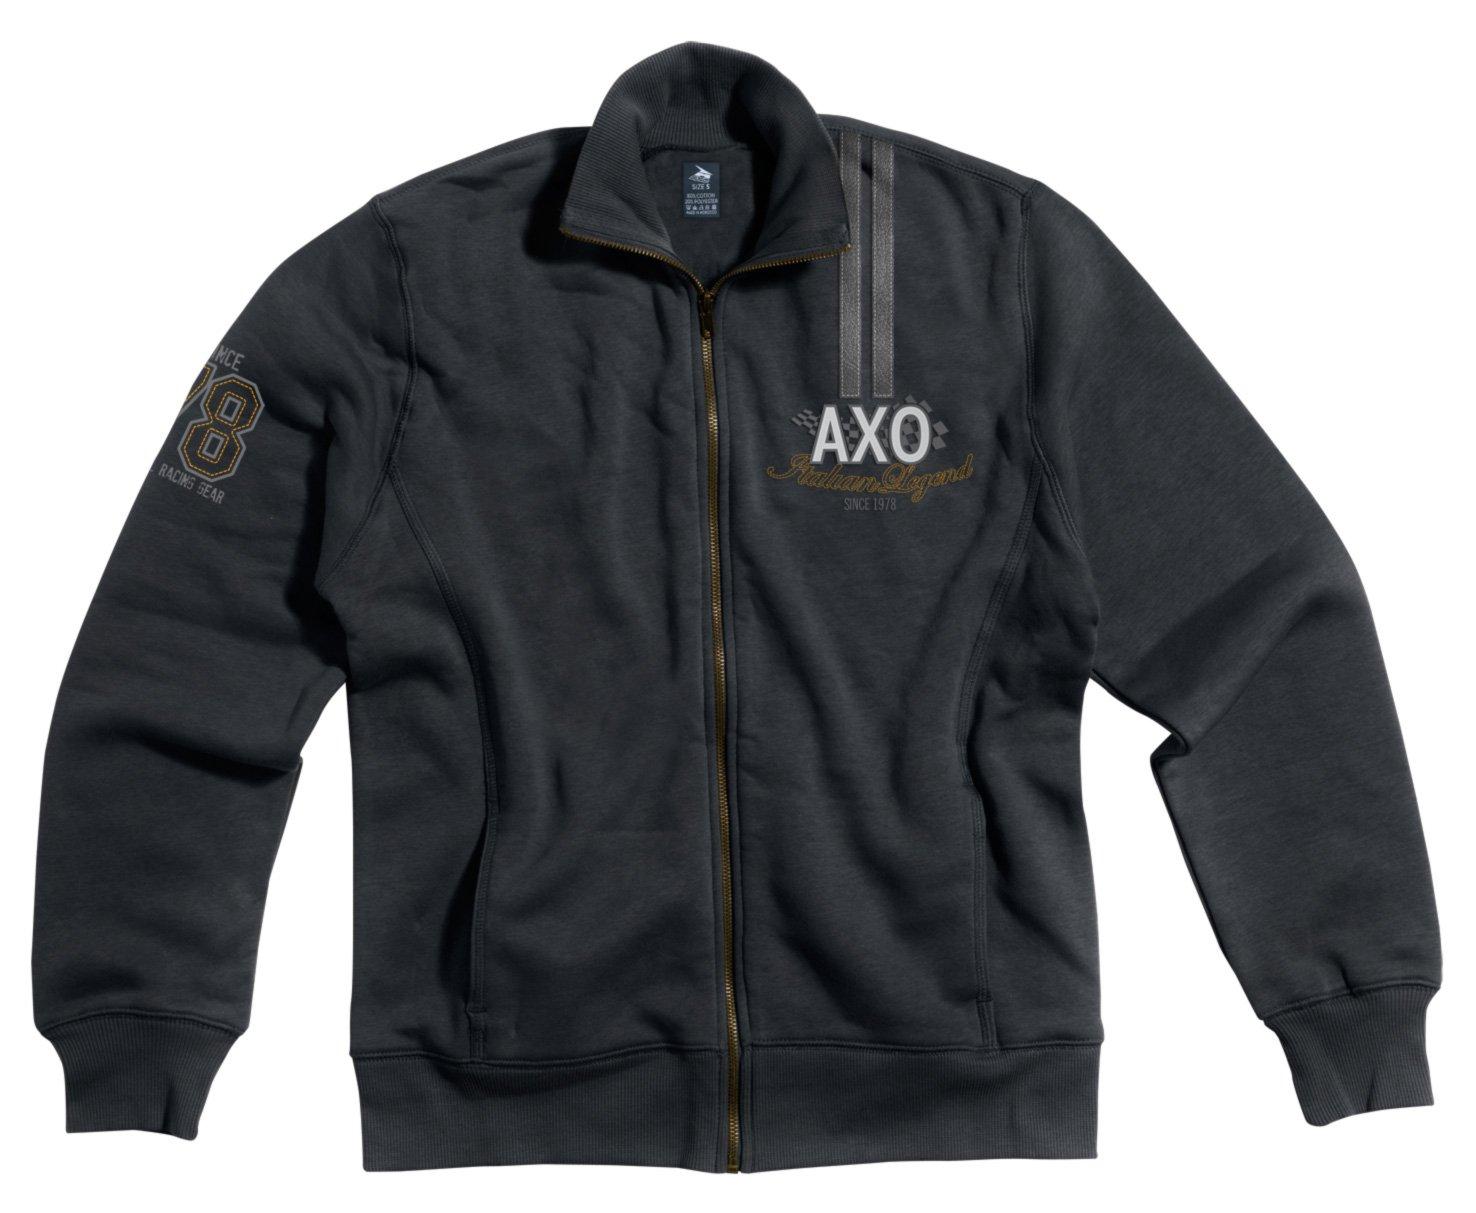 AXO Casual sudadera, color Negro/Blanco, talla XXL AXO INTERNATIONAL SRL FT5T0098-K00